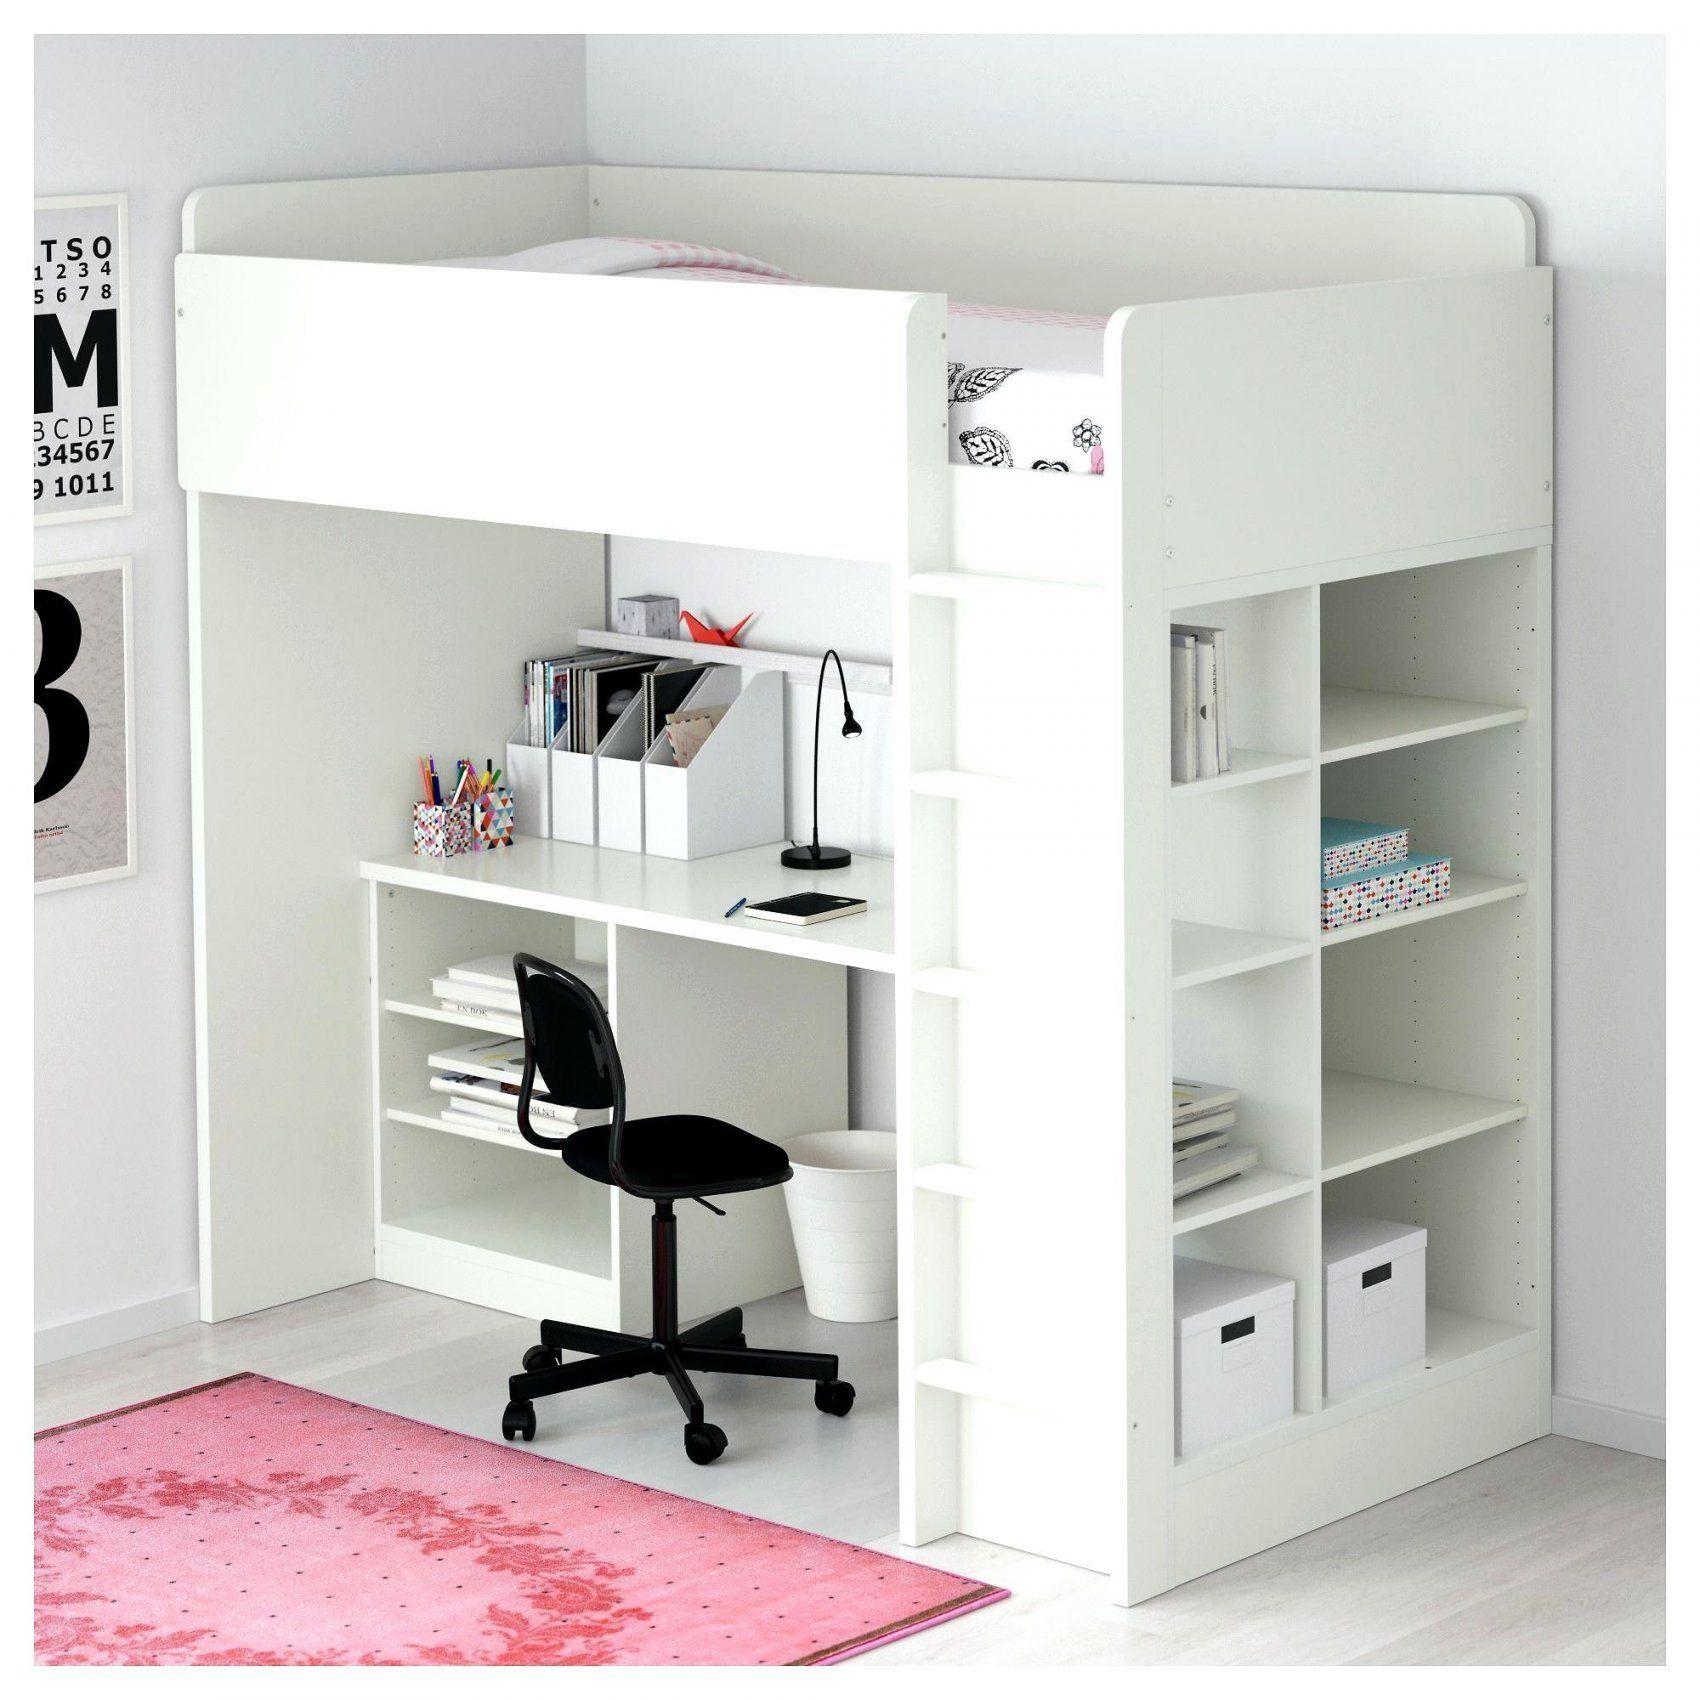 Lit Superposé Pour Fille Luxe Lit Mezzanine Avec Bureau Ikea